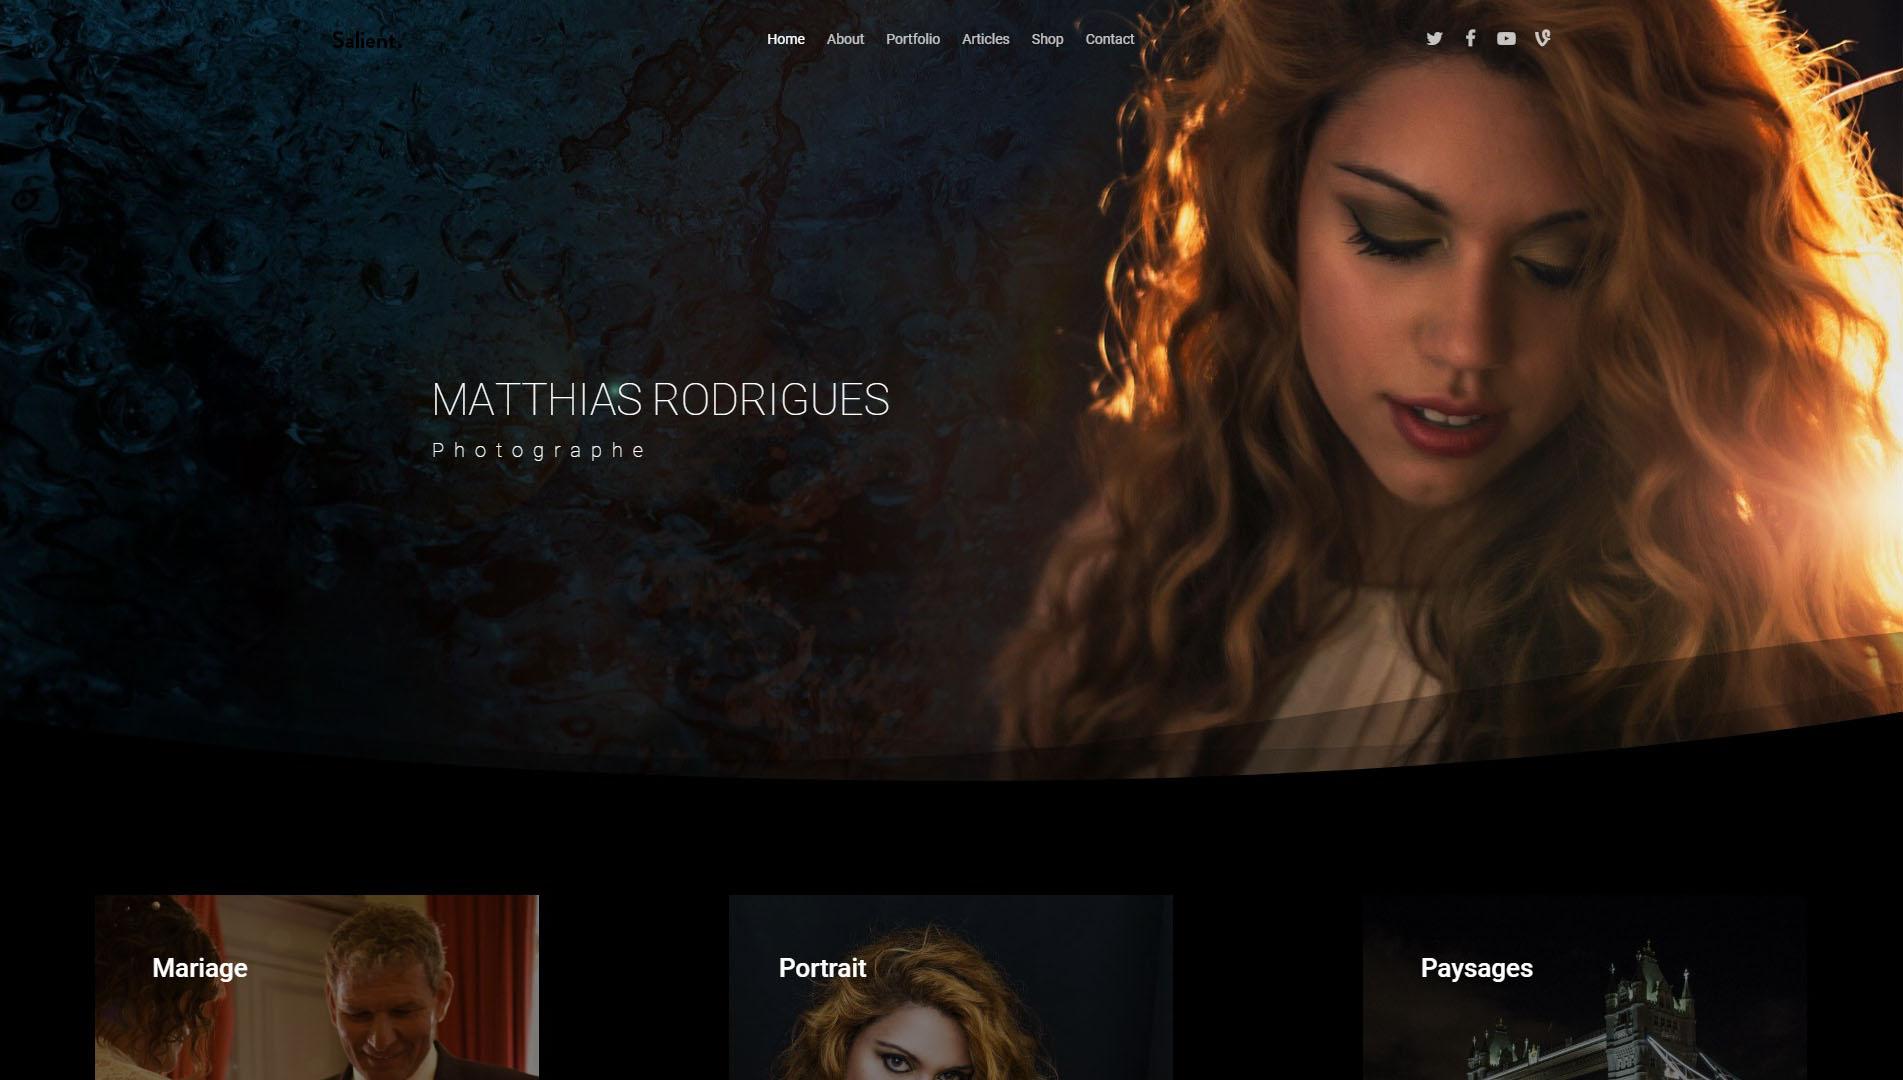 Matthias Rodrigues Photographe